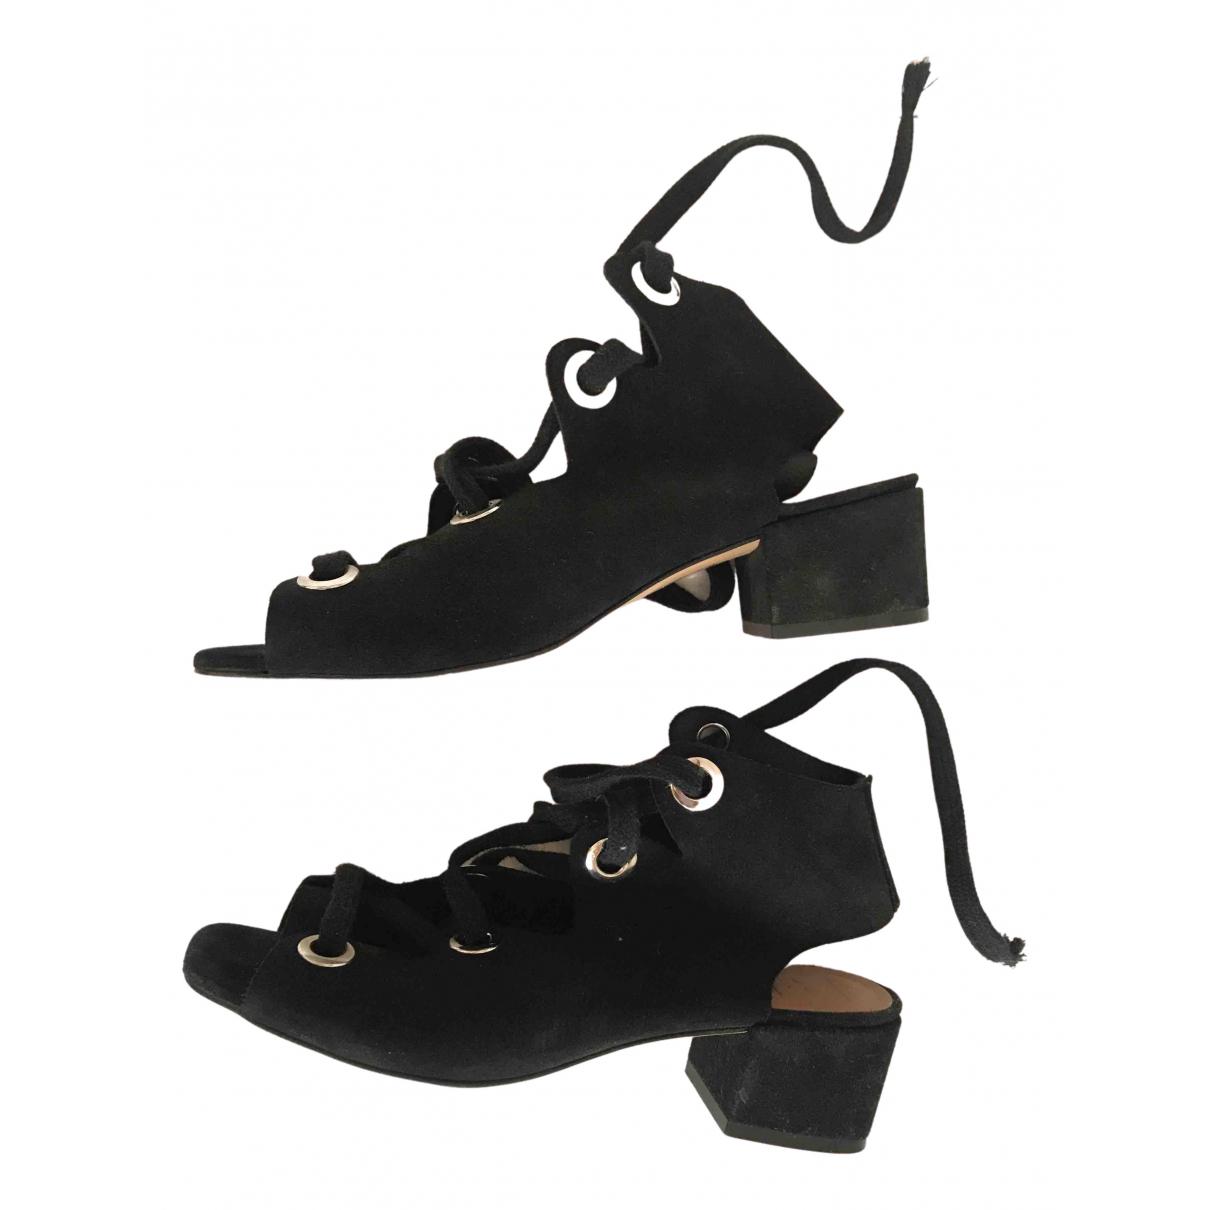 Bimba Y Lola N Black Suede Sandals for Women 38 EU